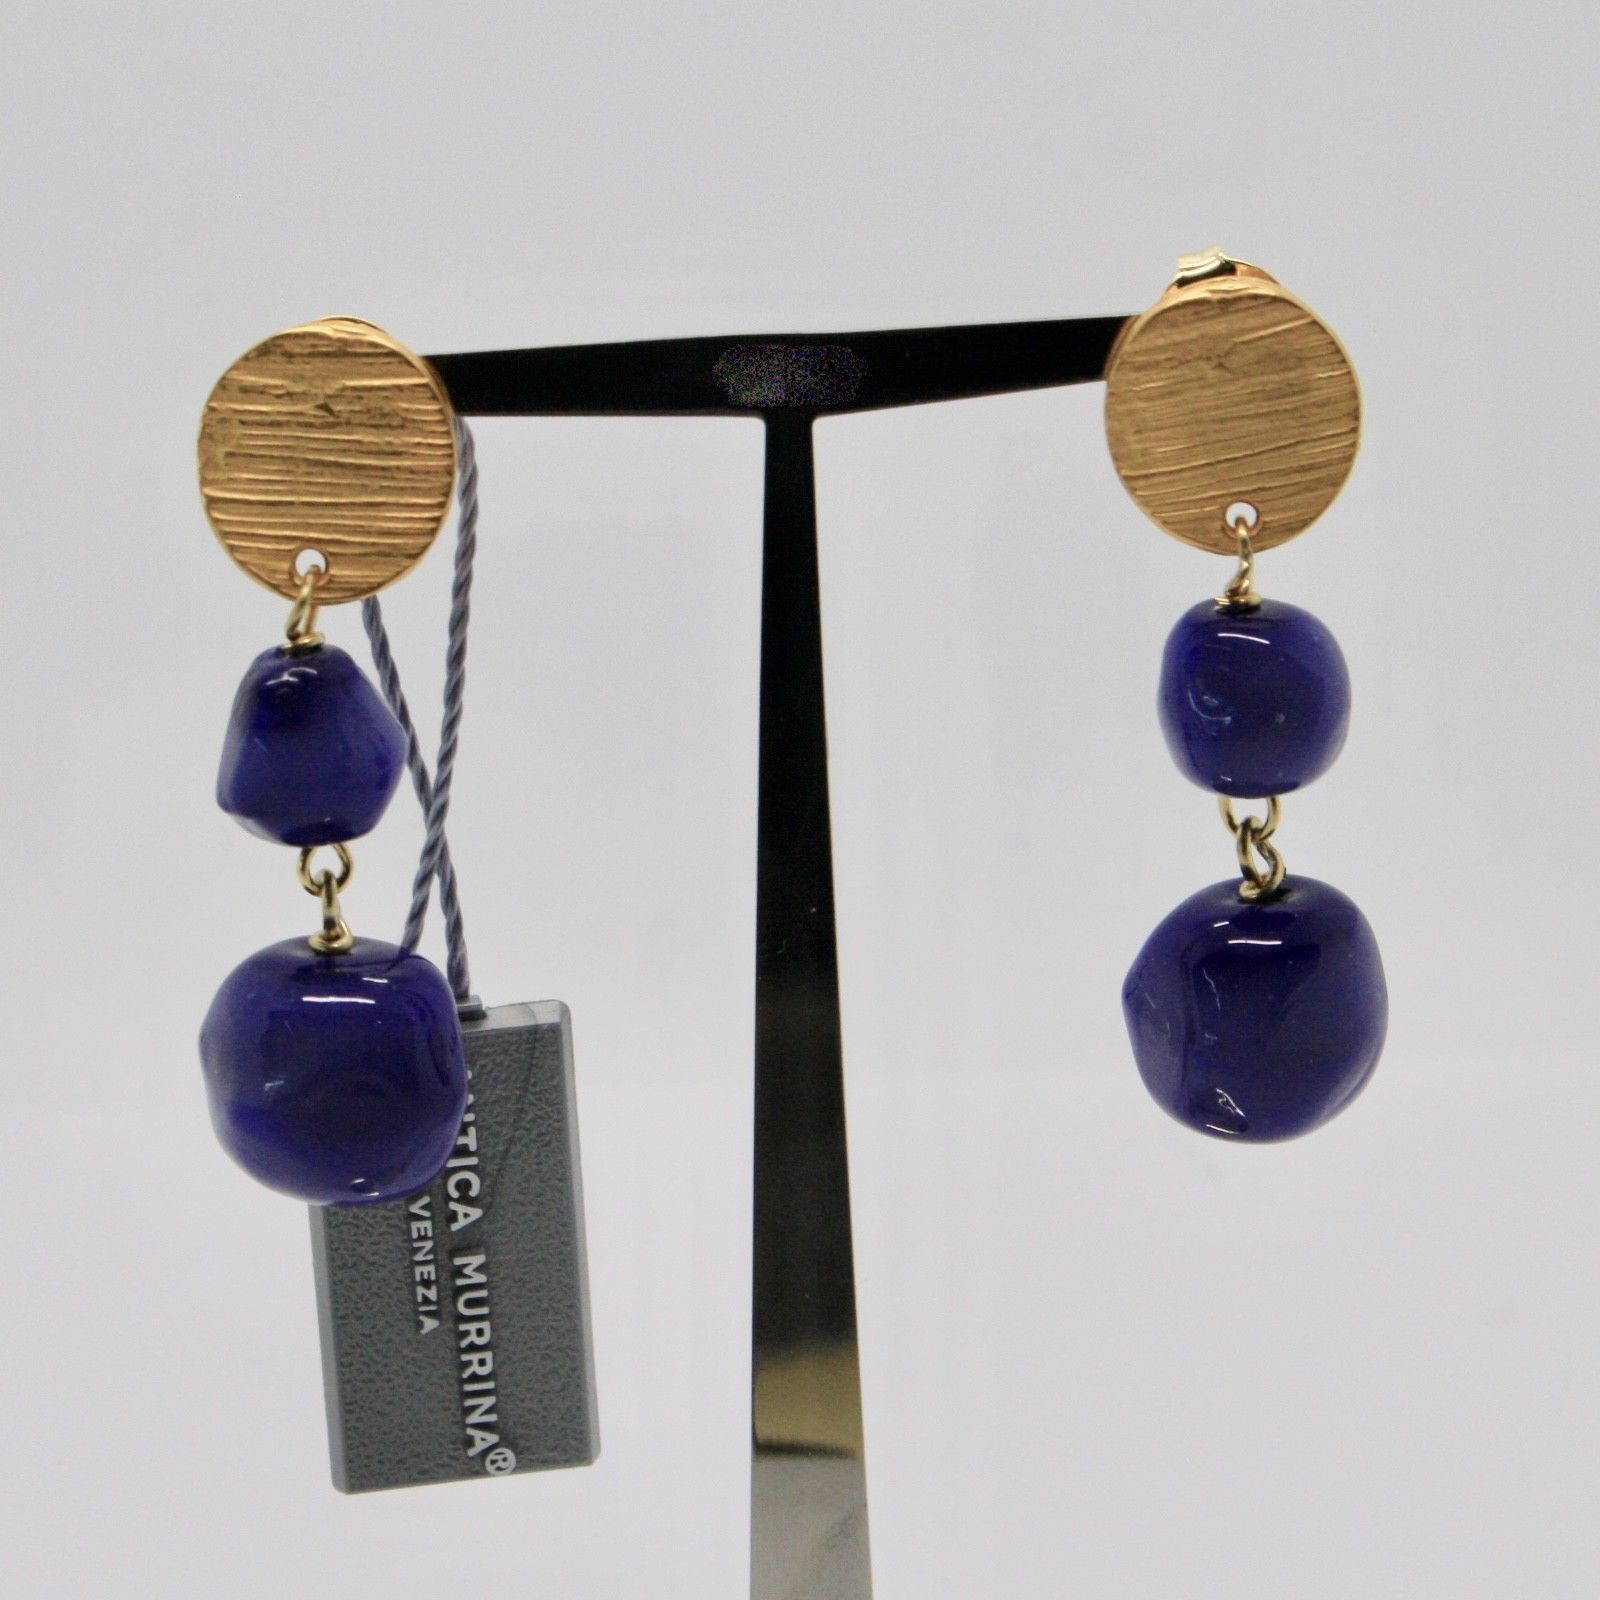 DROP EARRINGS ANTICA MURRINA VENEZIA WITH MURANO GLASS BLUE OR572A06